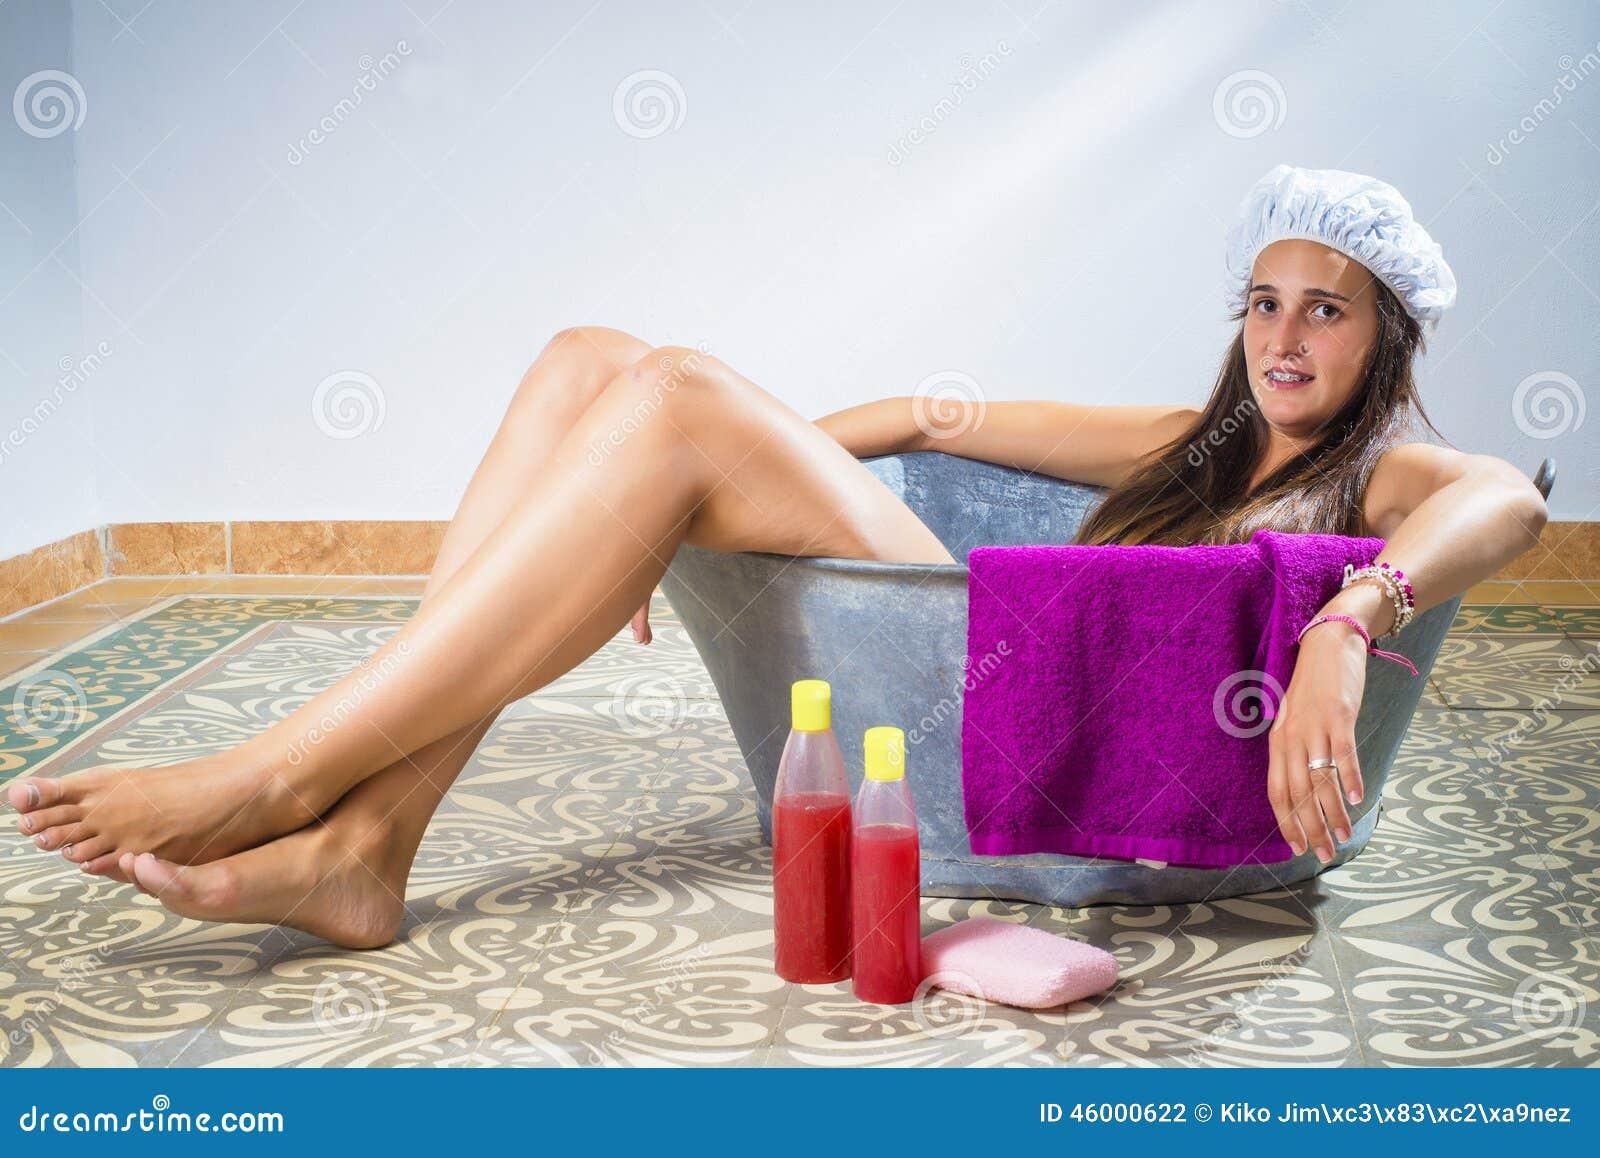 Retro Bathtub Pinup Kiss Stock Photo - Download Image Now